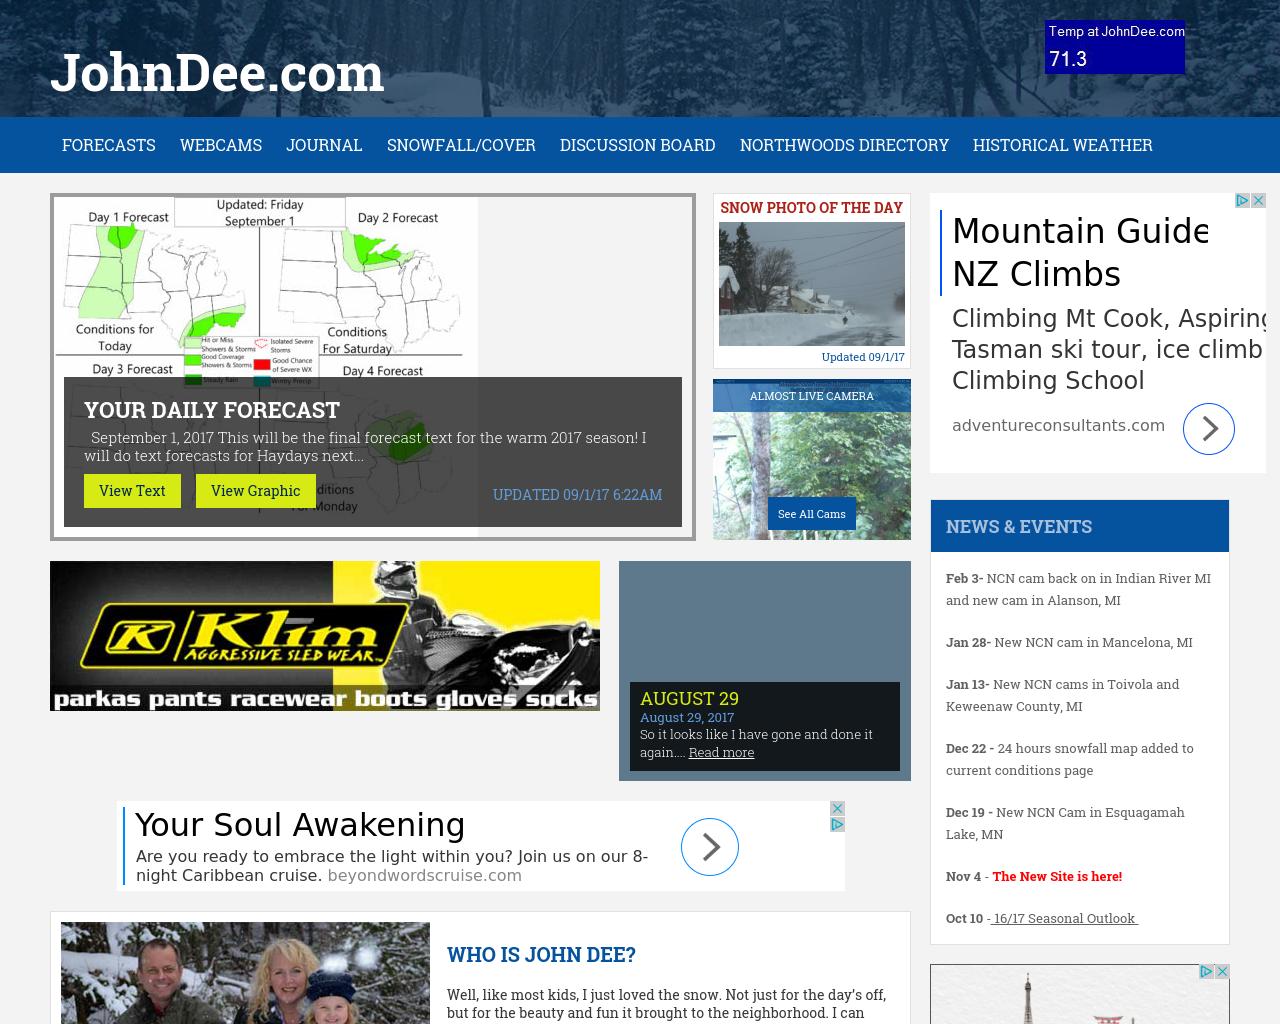 John-Dee.com-Advertising-Reviews-Pricing